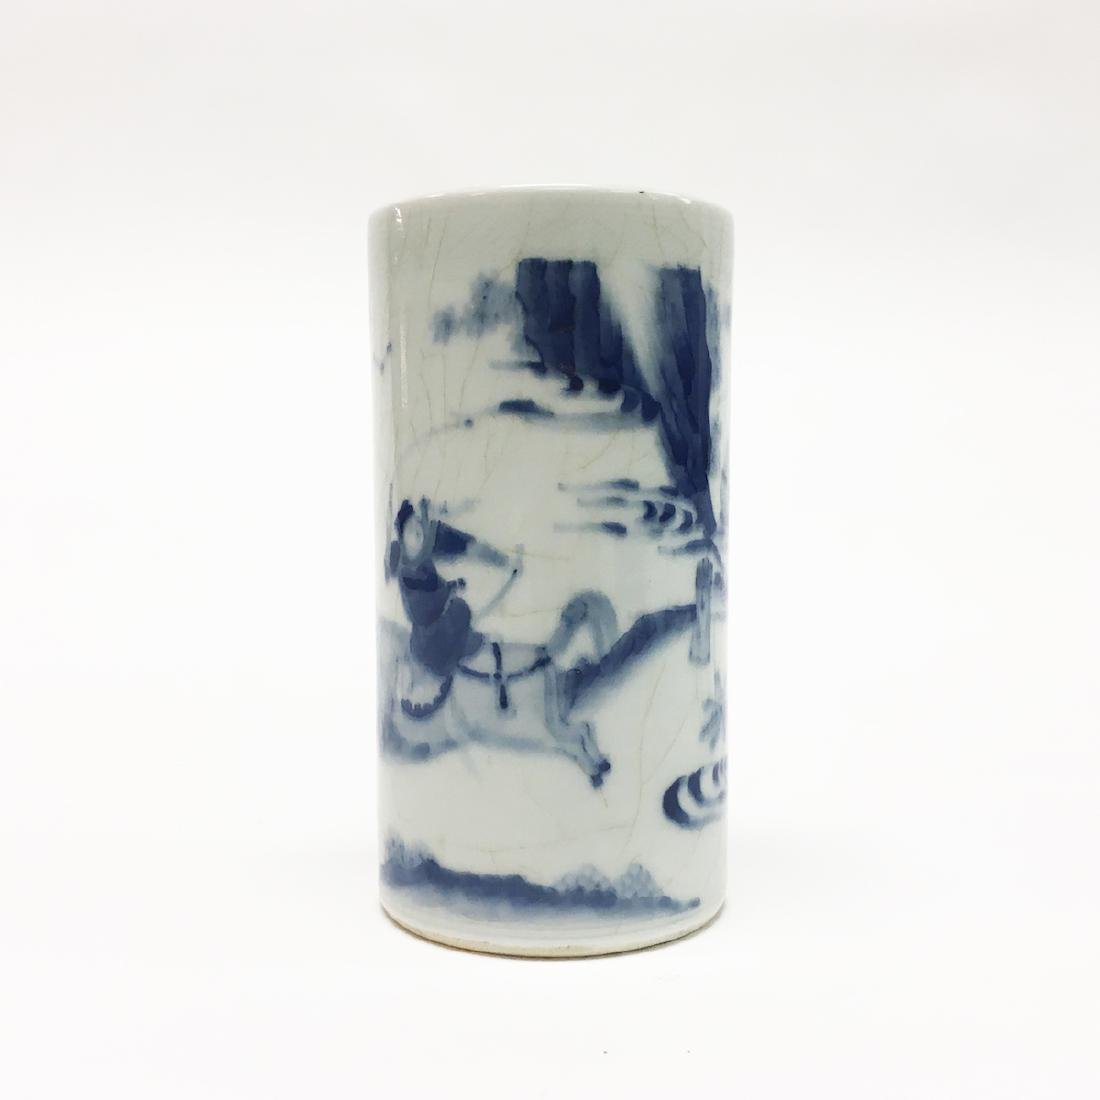 Chinese Porcelain Blue and White Brush Pot - 2